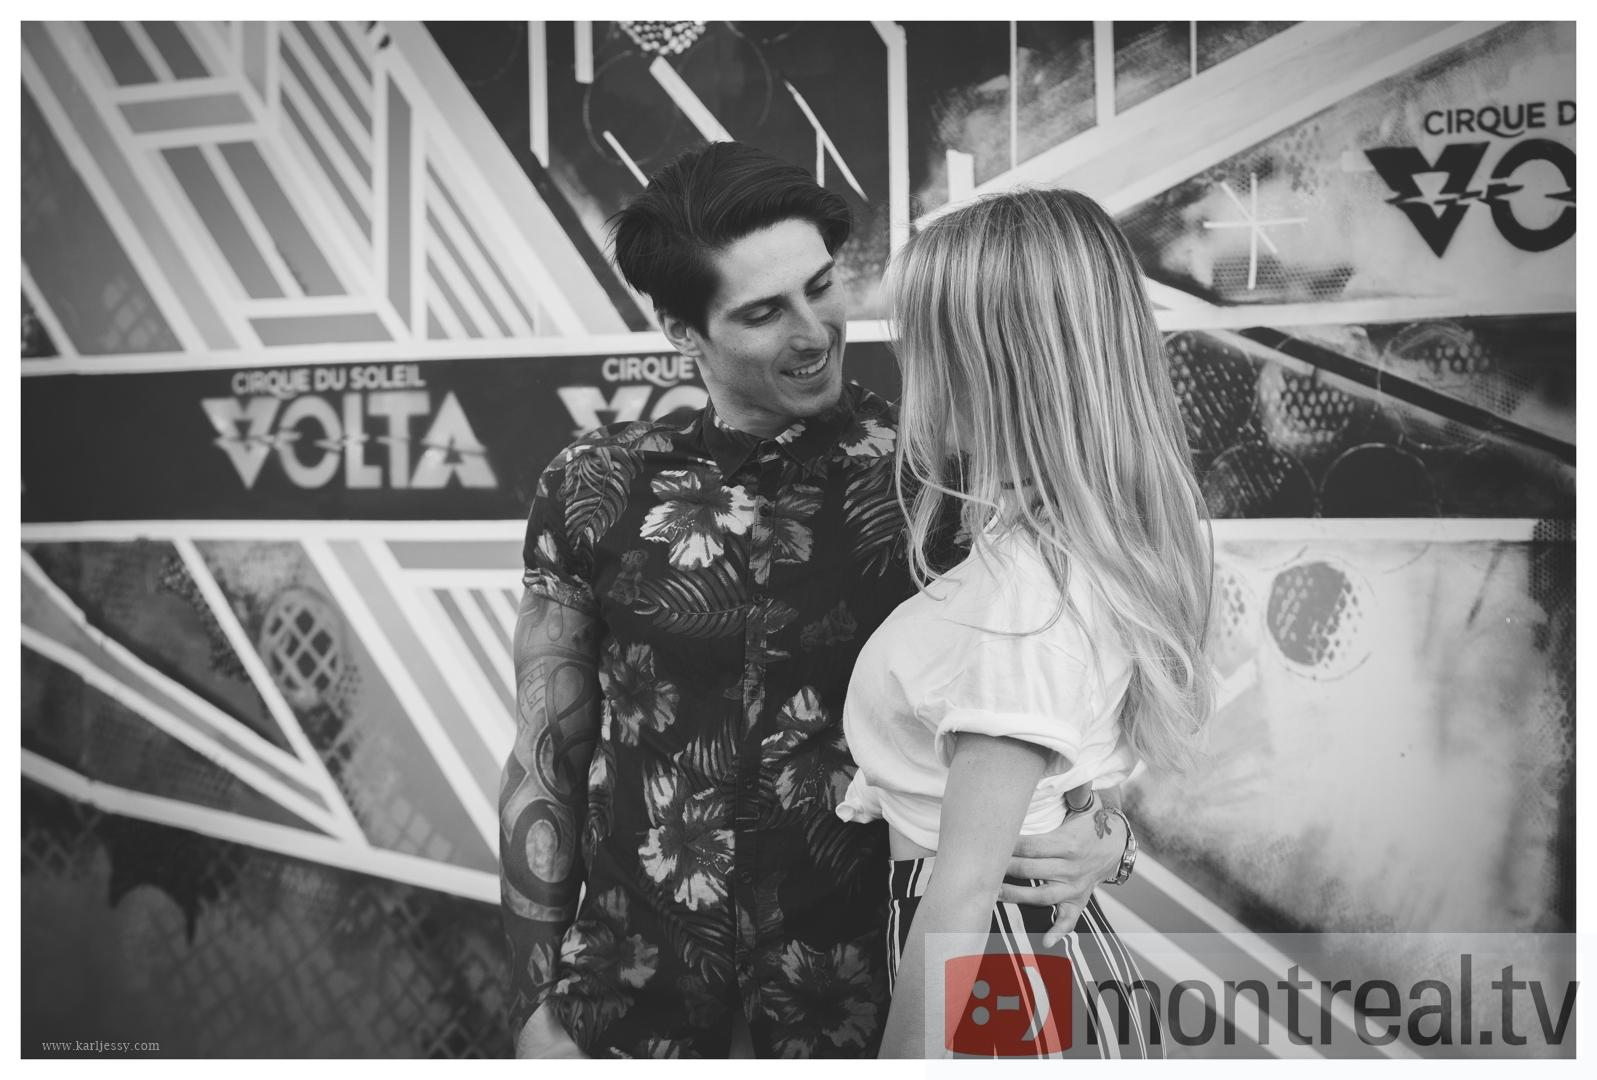 kevin bazinet_VOLTA_RedCarpet_MontrealTV_0003